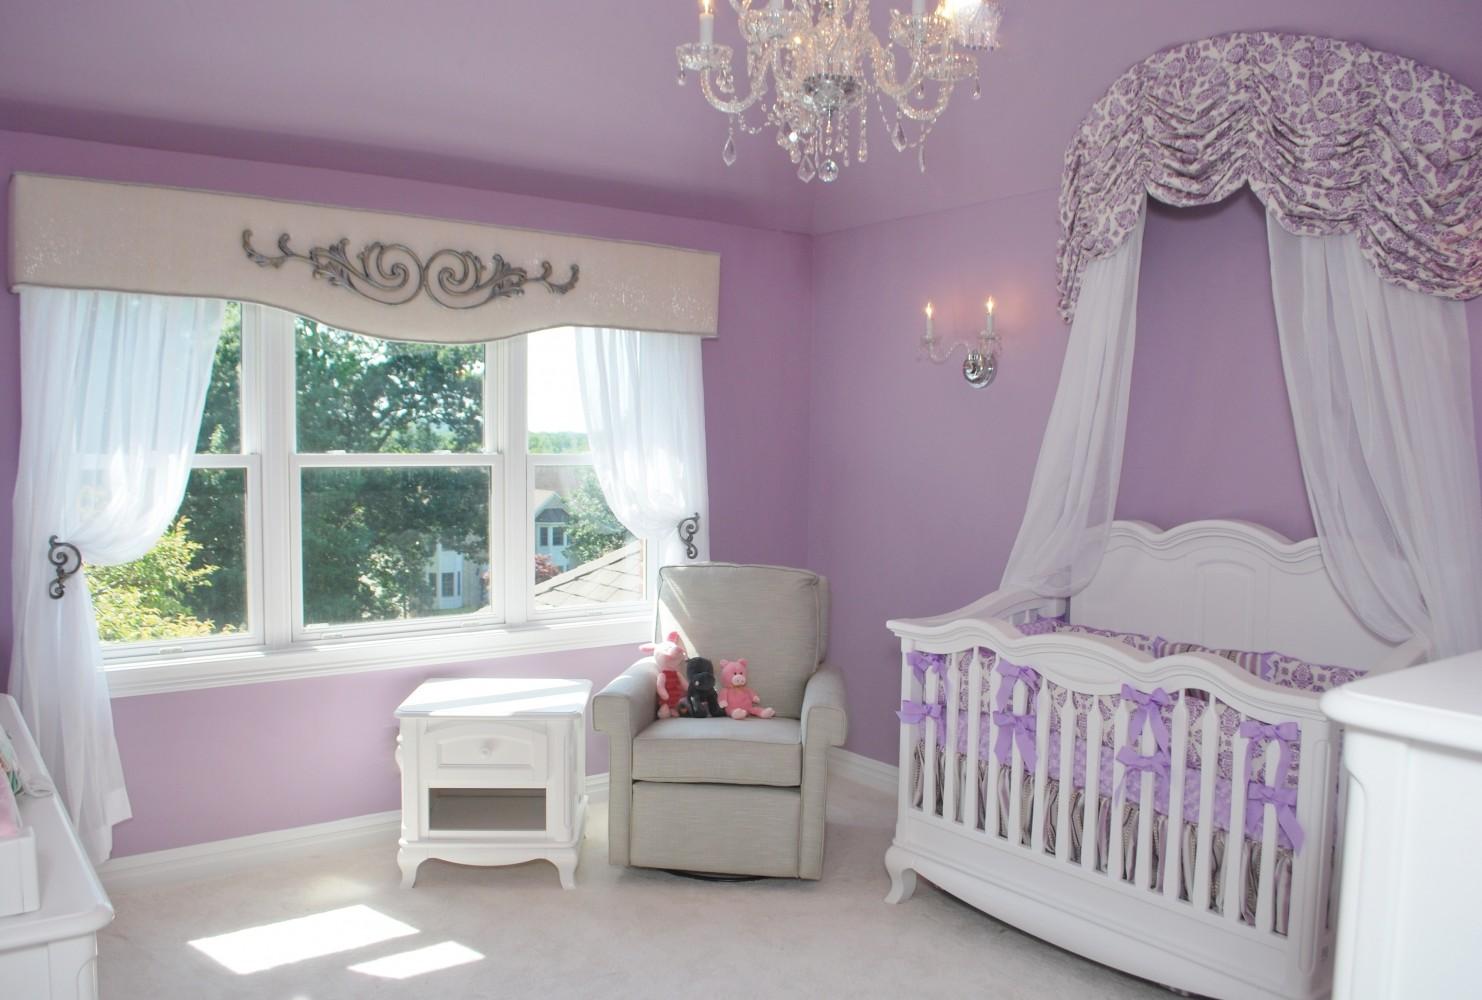 Baby Room Interior Designer | Marlton, NJ | Distinctive Interior Designs